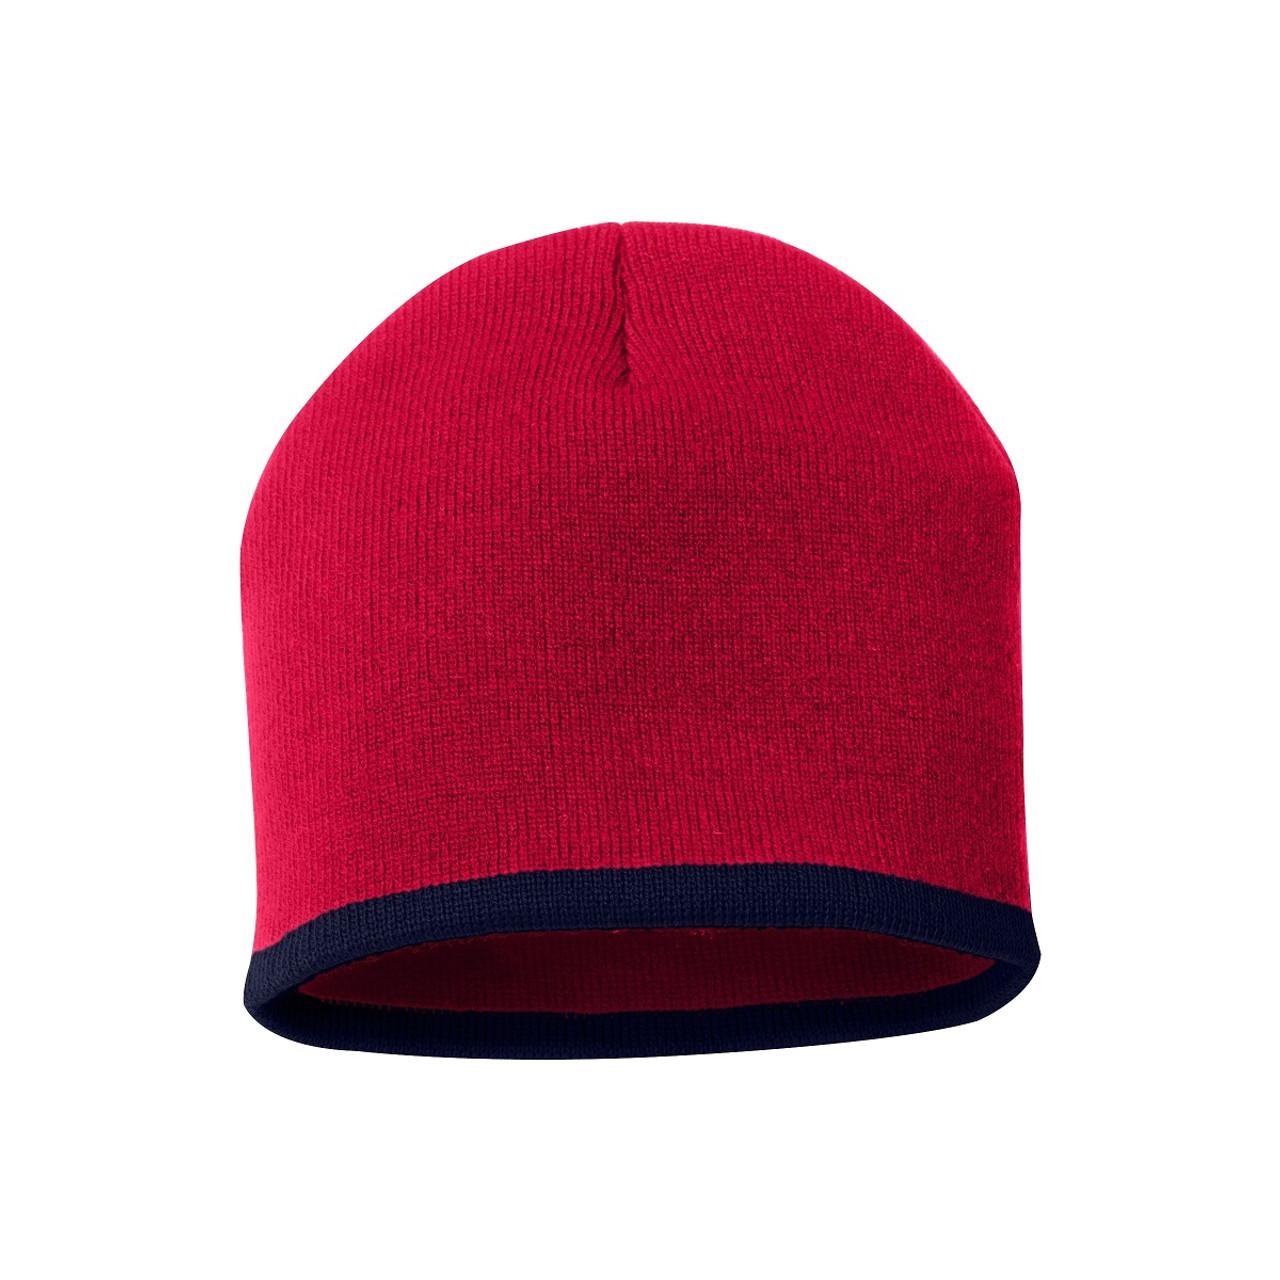 "Red/Navy - SP09 Sportsman Bottom Stripe Acrylic Knit 8"" Toque | T-shirt.ca"